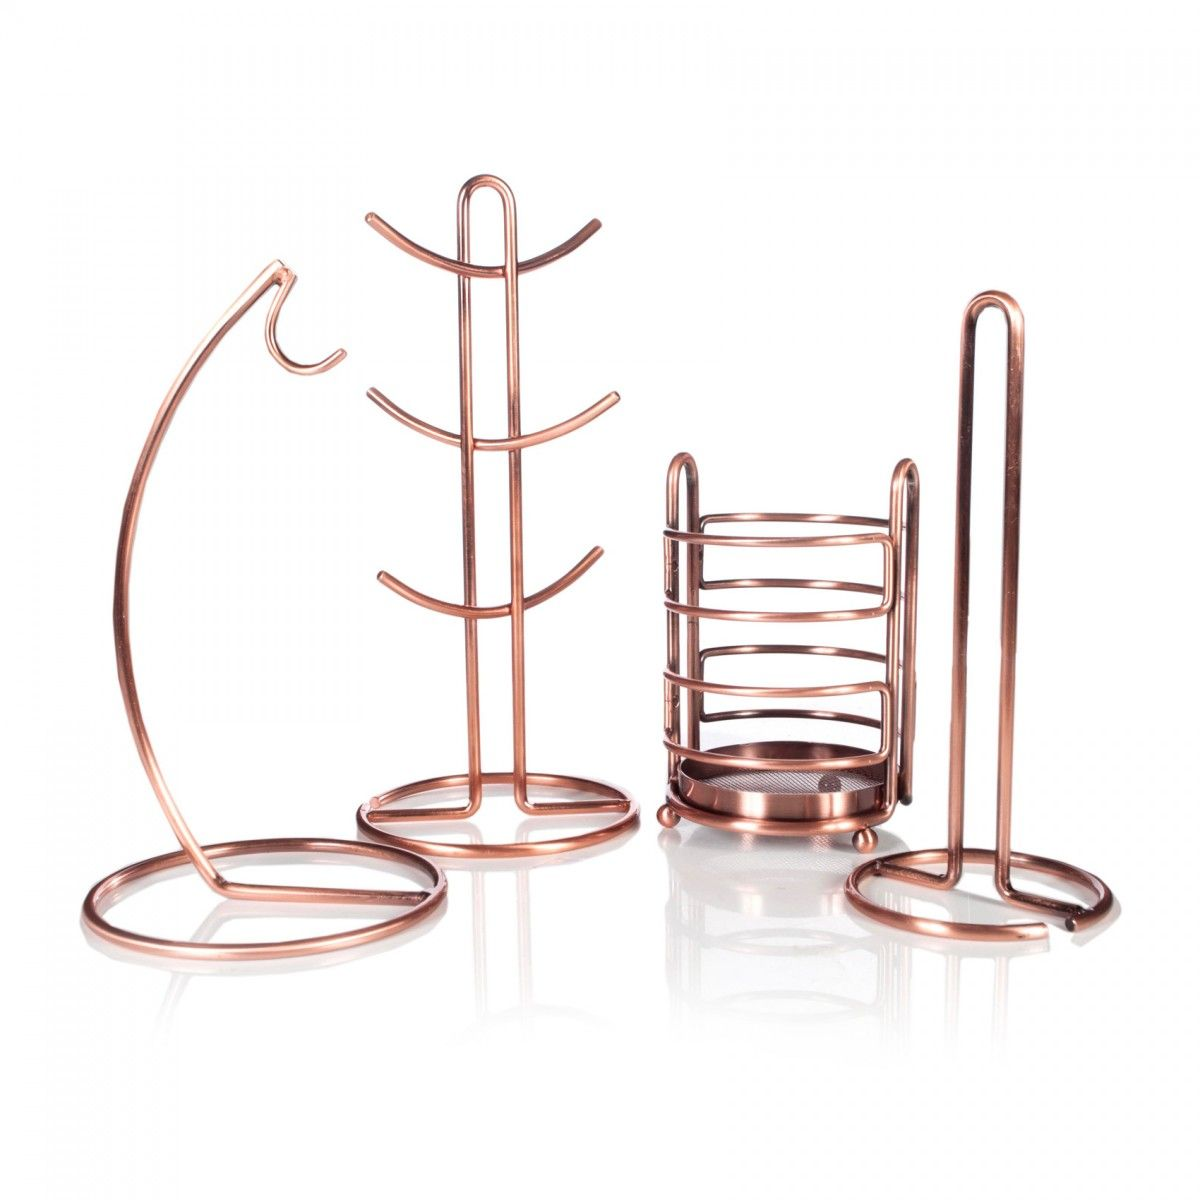 Copper Kitchen Utensil Holder Countertop Options For David Mason Design Fusion Worktop Storage